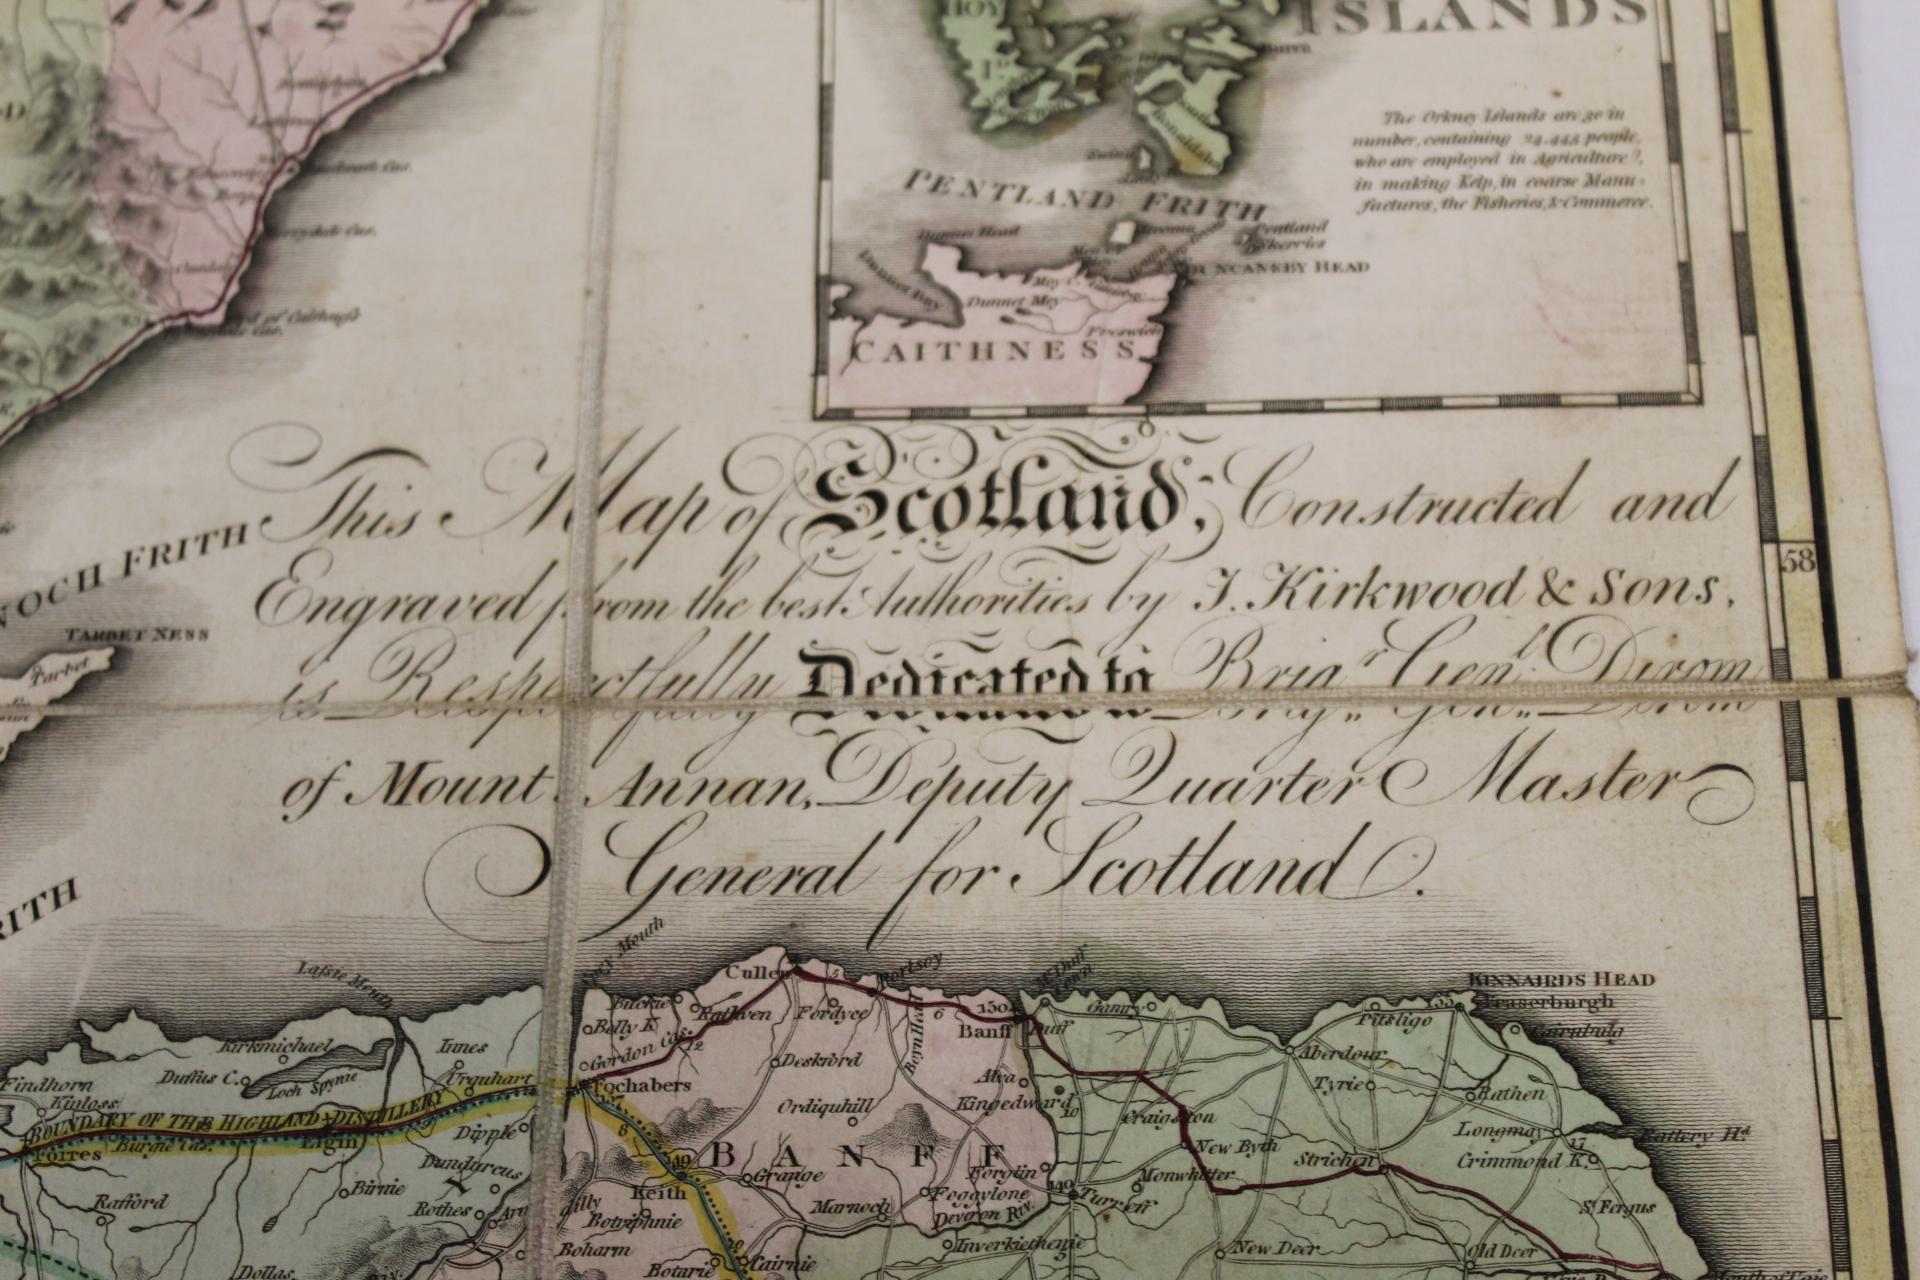 KIRKWOOD J. & SONS.Map of Scotland. Hand col. eng. fldg. linen map in well worn orig. slip case. - Image 16 of 36